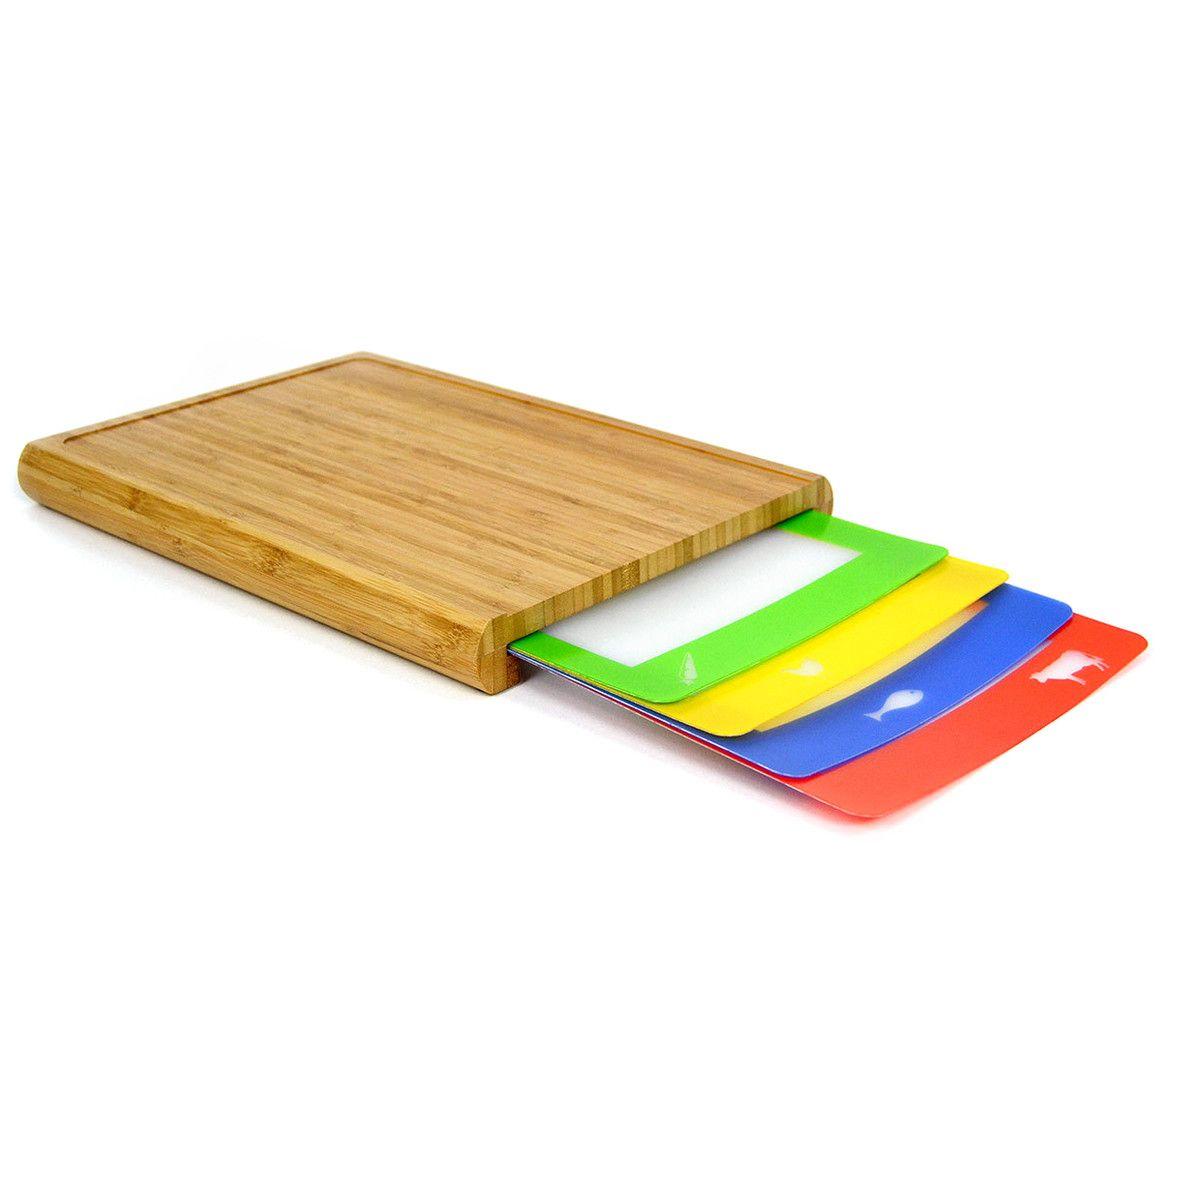 Chop n prep cutting board set durablebamboo chopping block that